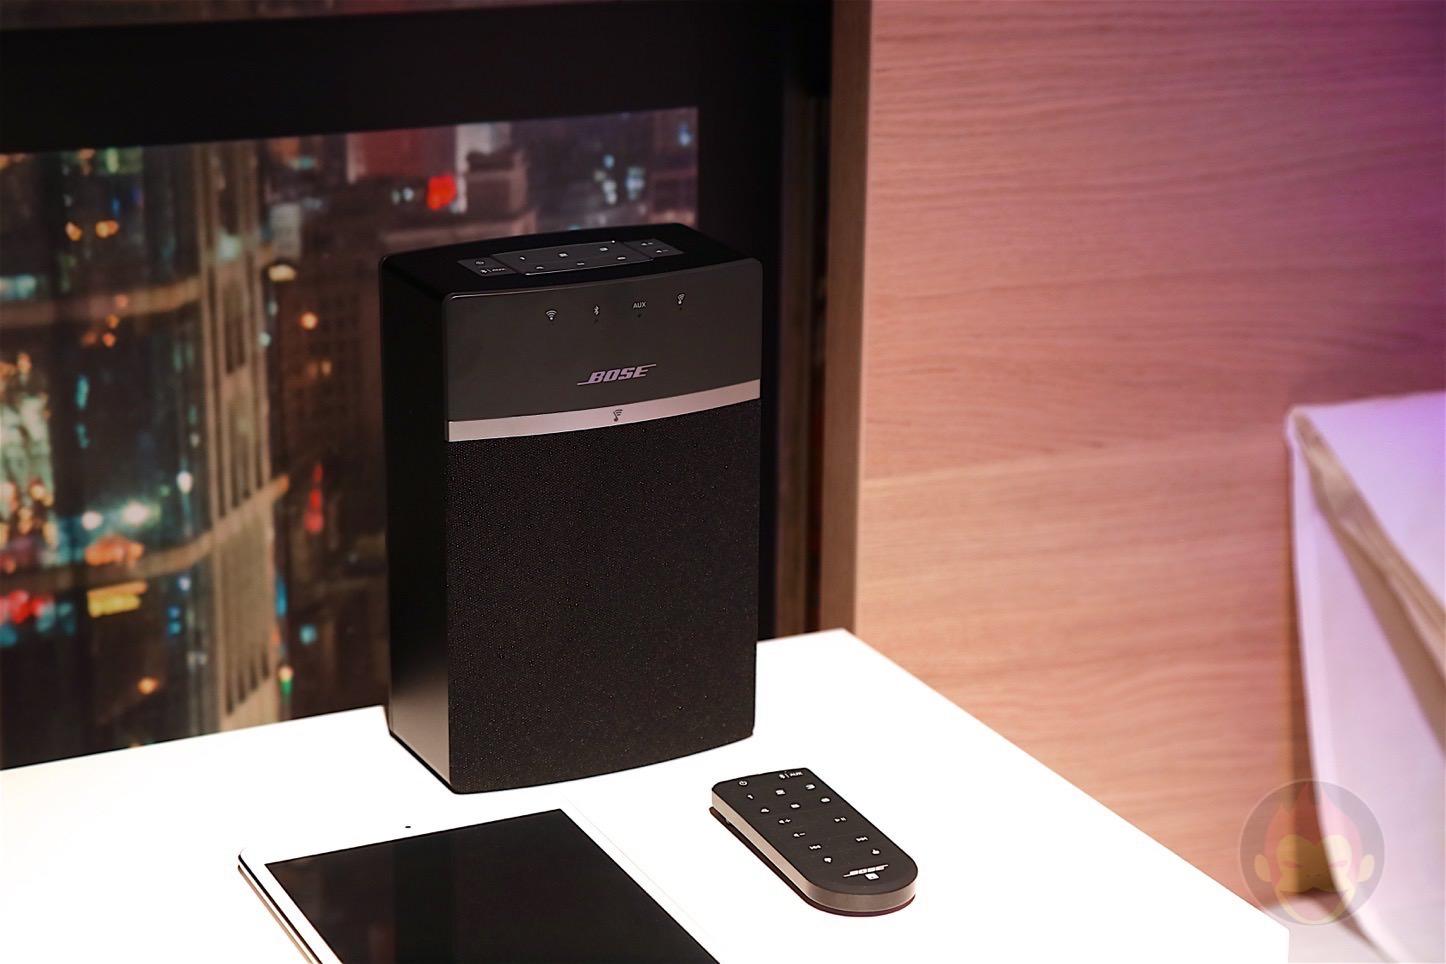 Bose-SoundTouch-Wireless-Speakers-05.jpg